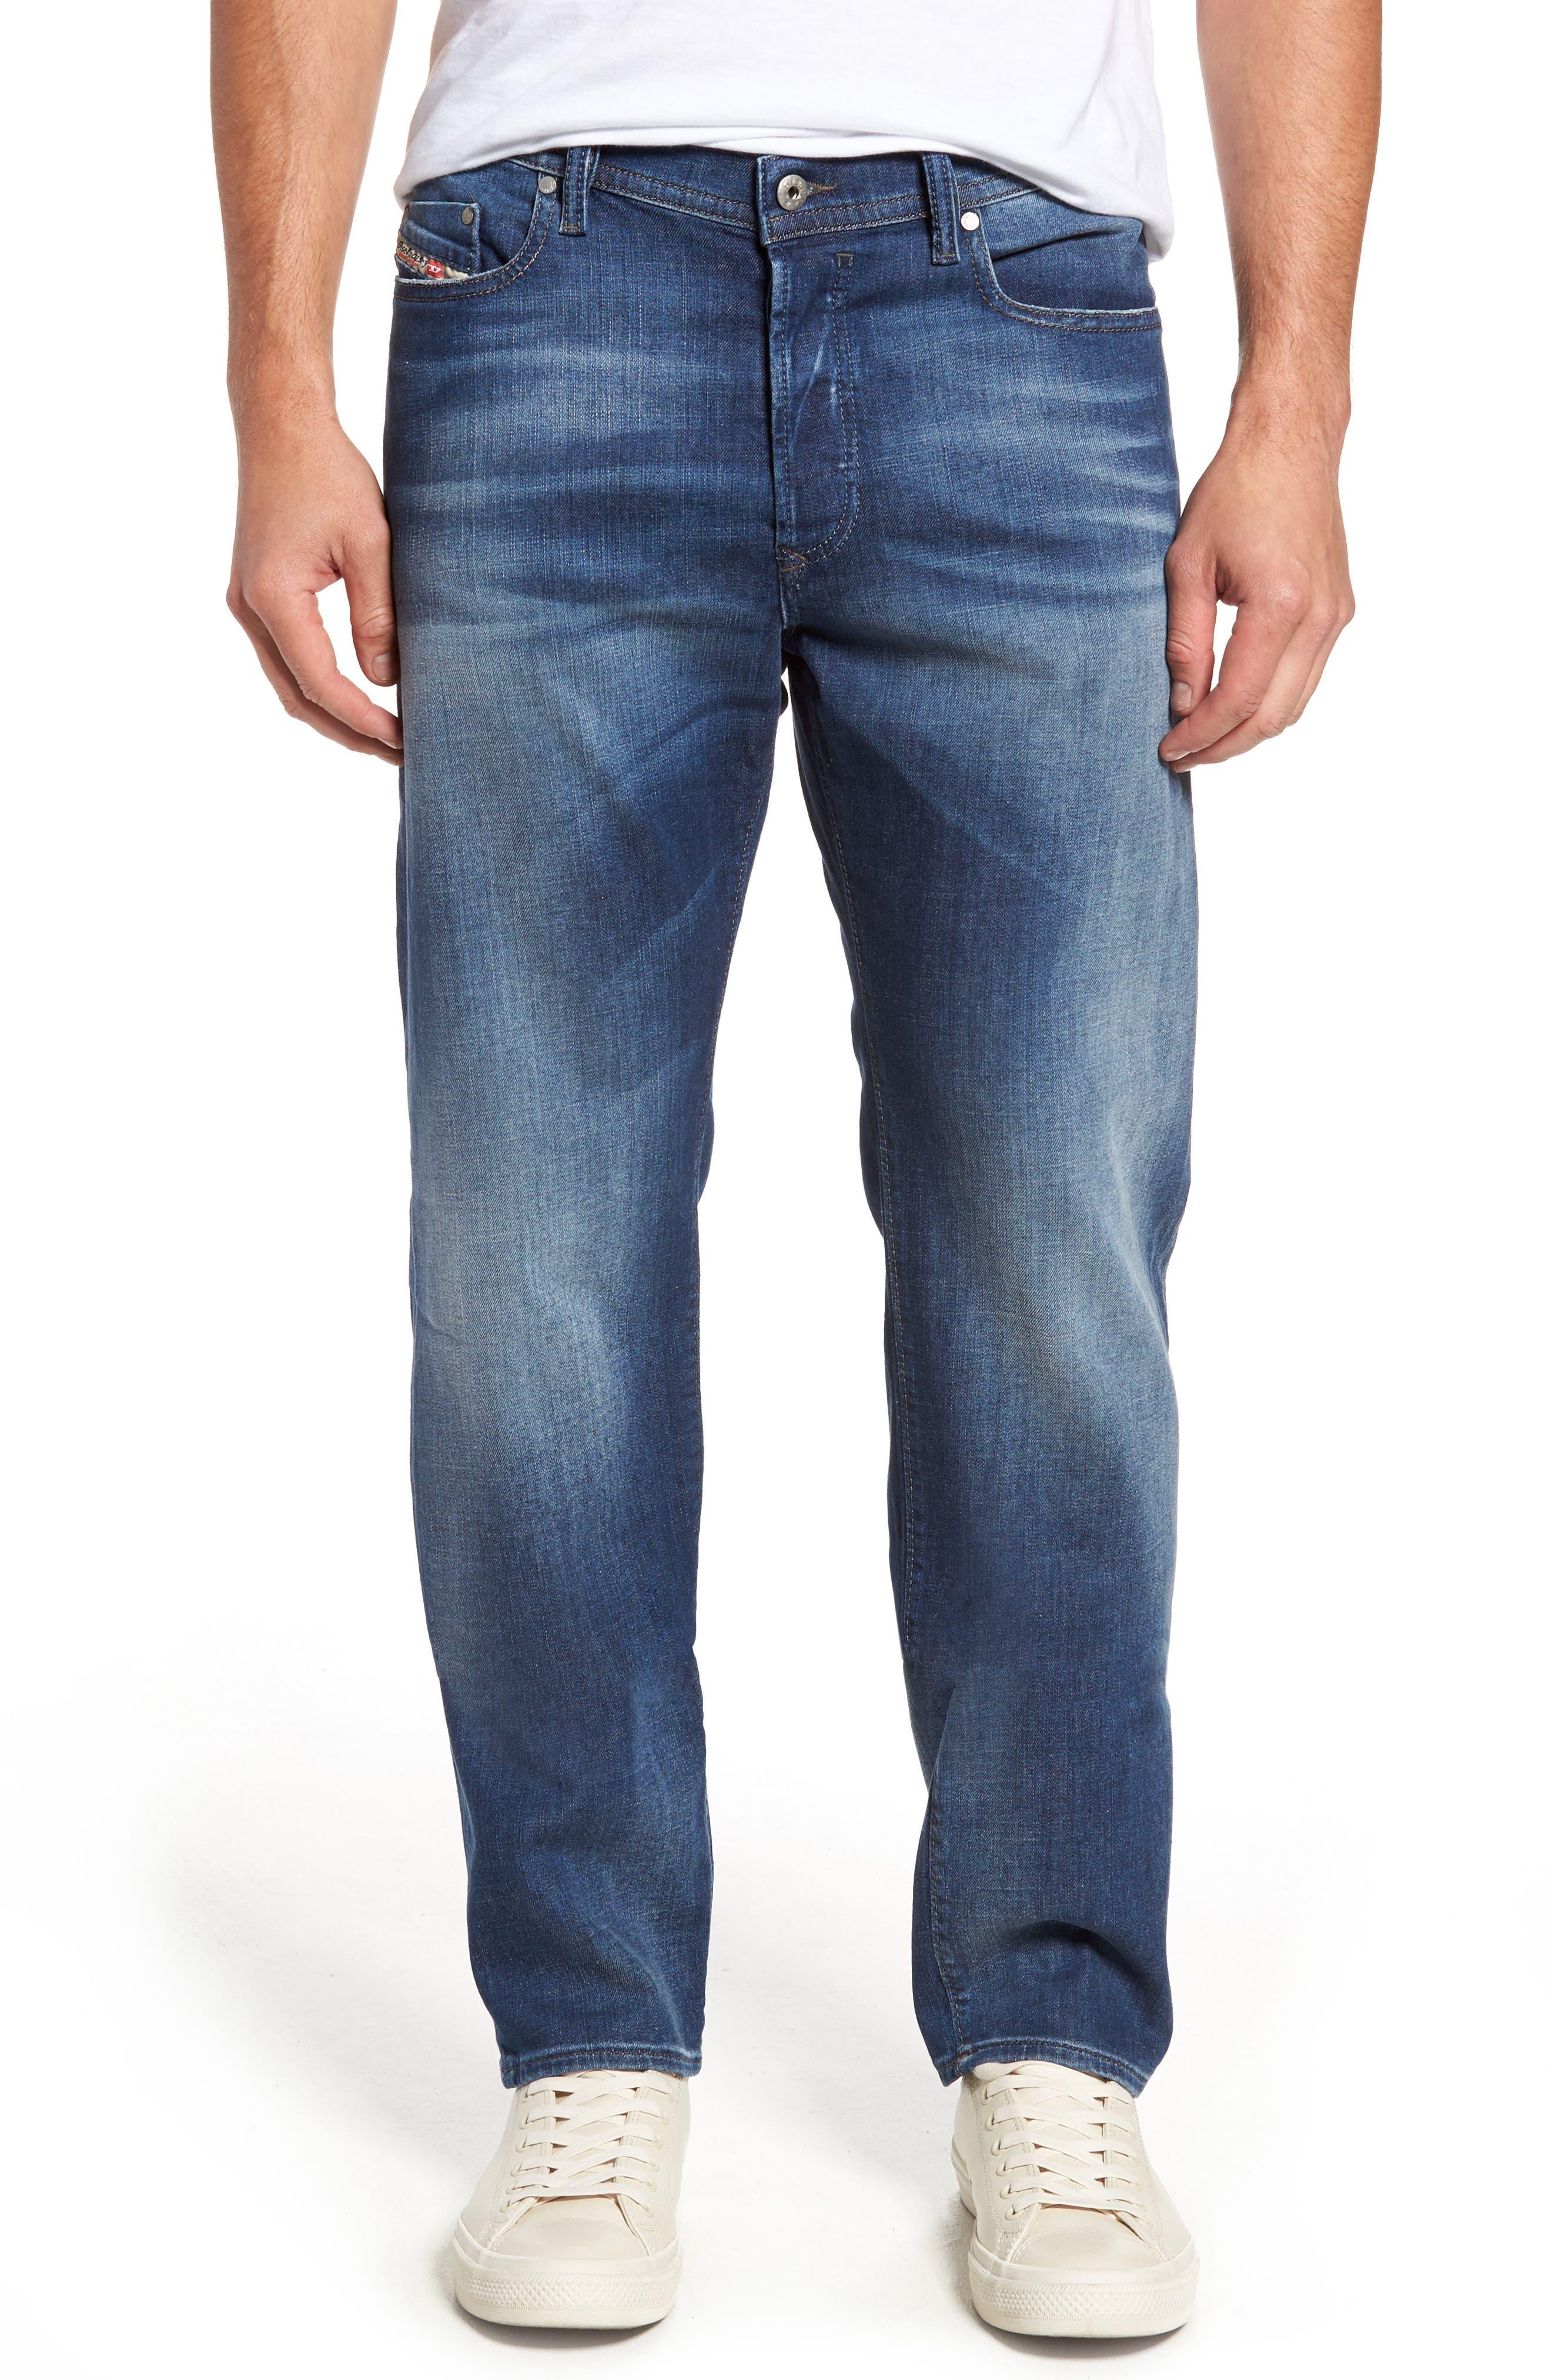 Thytan Straight Leg Jeans,                             Main thumbnail 1, color,                             400